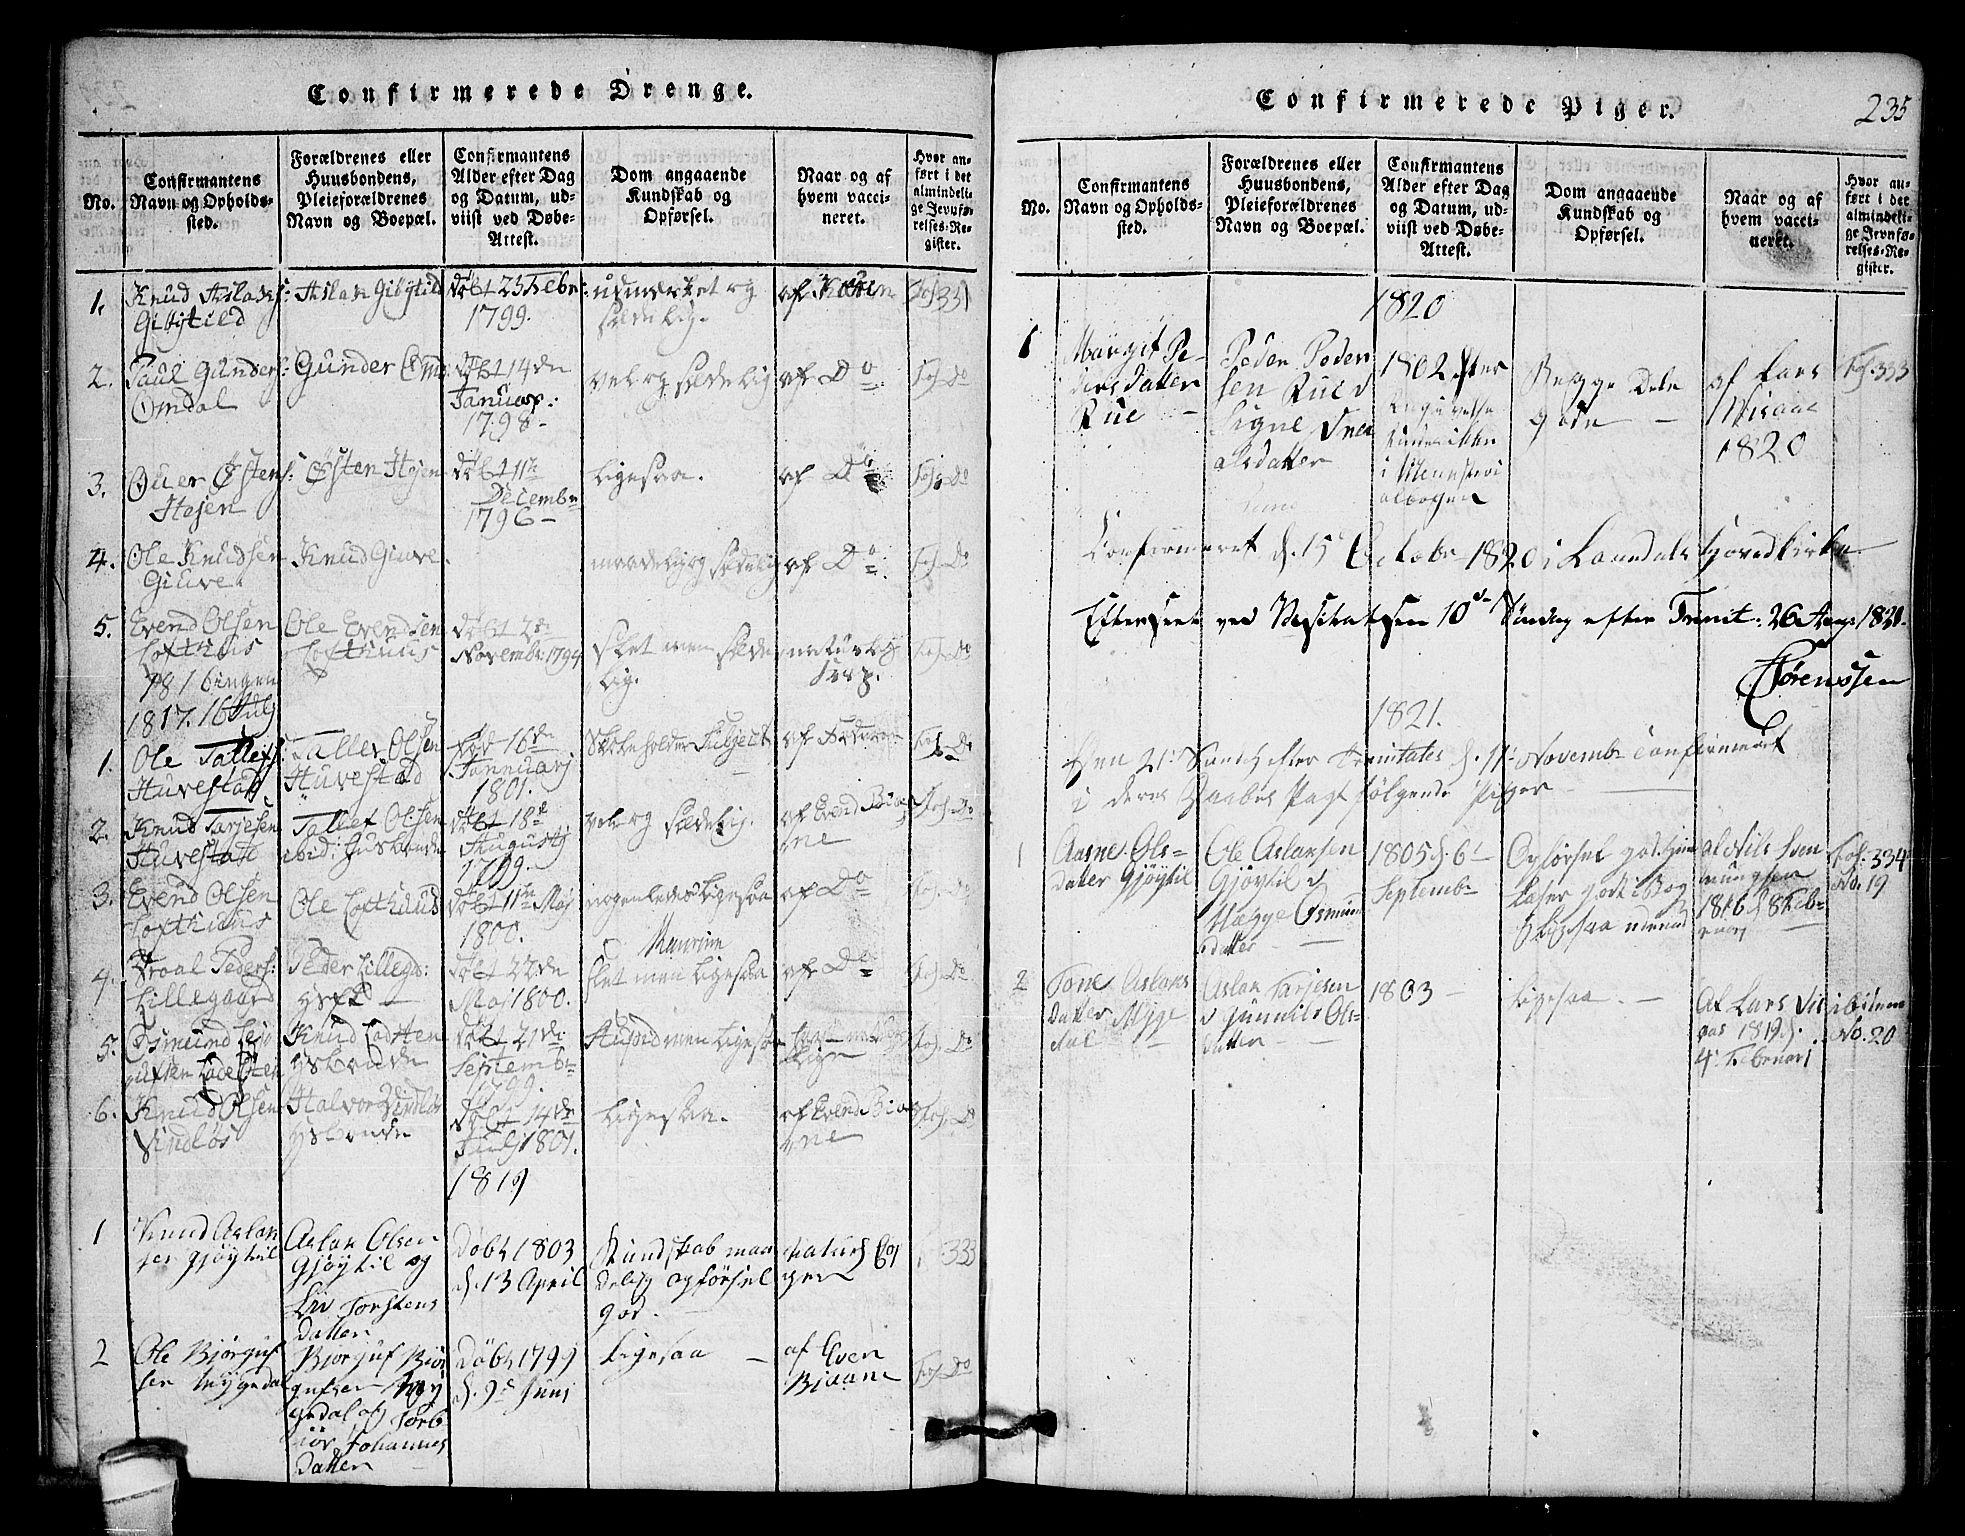 SAKO, Lårdal kirkebøker, G/Gb/L0001: Klokkerbok nr. II 1, 1815-1865, s. 235